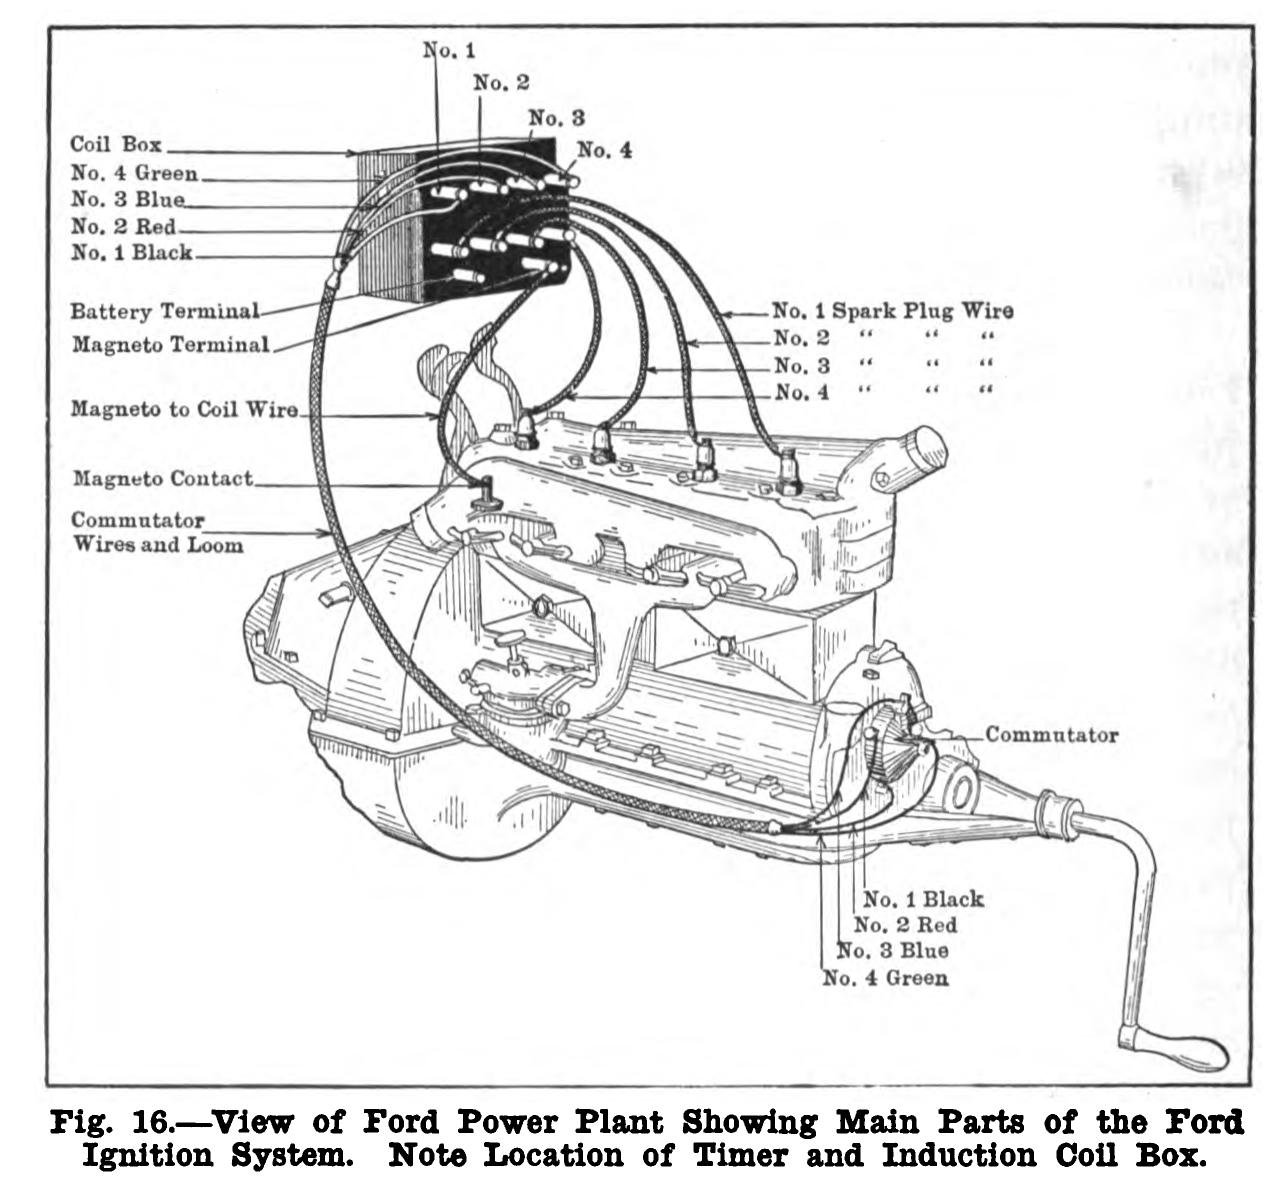 Ford Model A Ignition Wiring Diagram 9v Battery 1917 T Car Figure 16 Pinterest